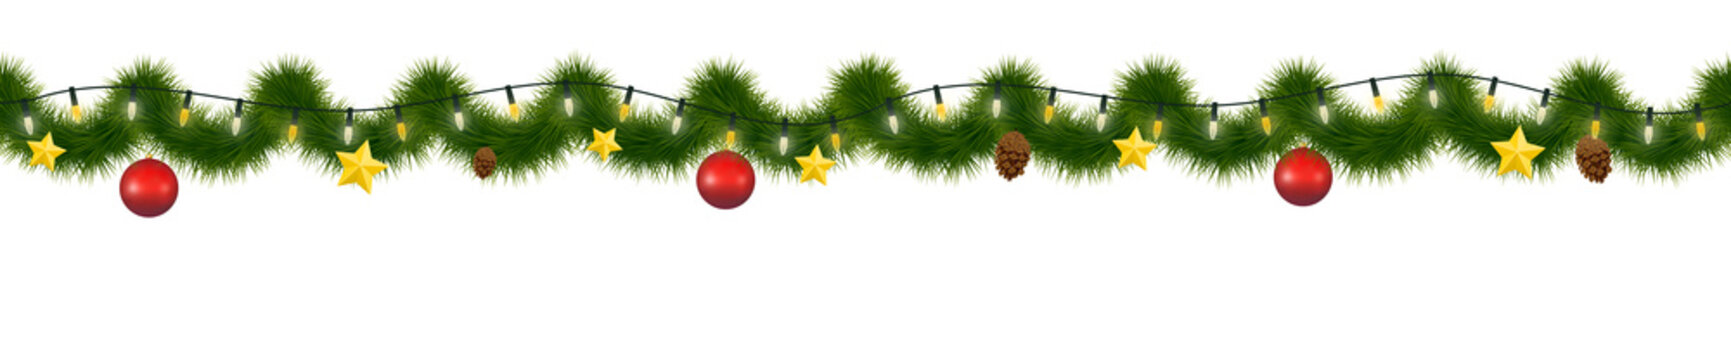 Festive Christmas garland. New Year decorative torse, Horizontally seamless festoon.